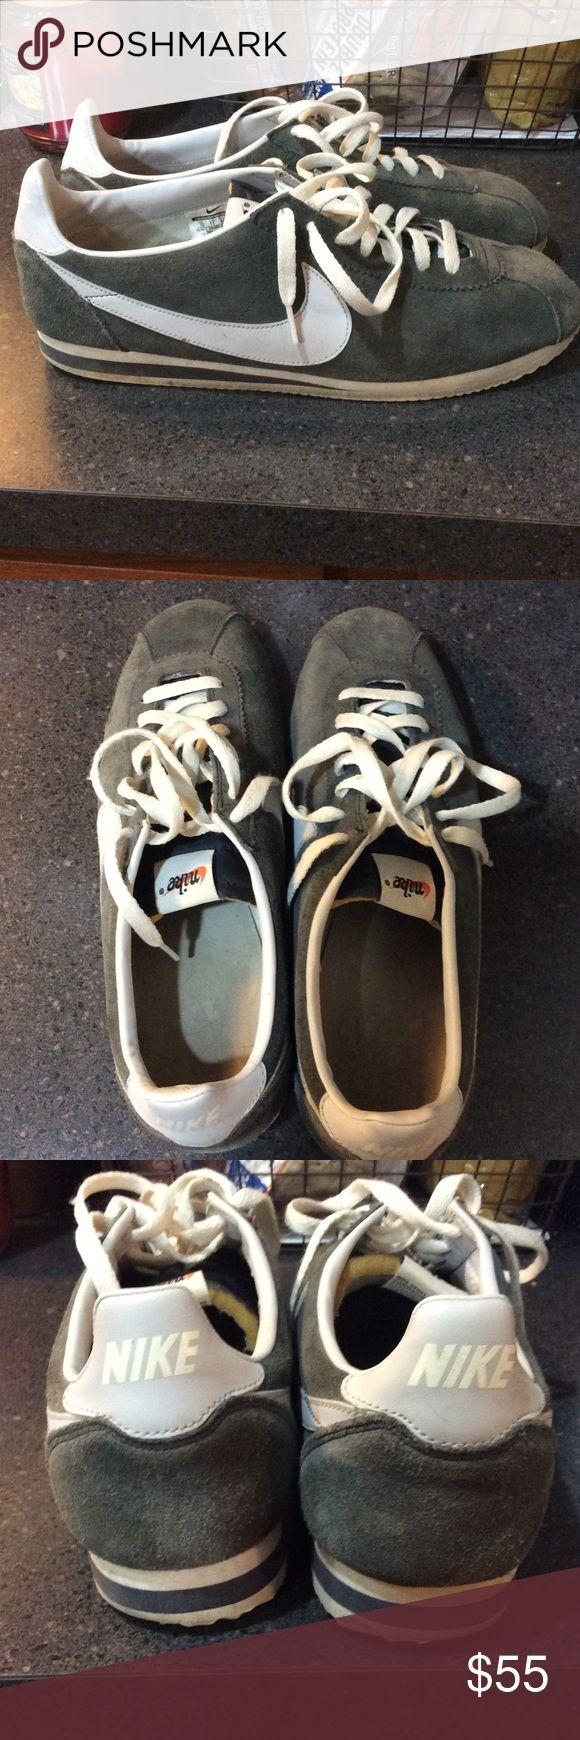 Men's Nike Cortez Men's, size 12. Barely worn. Nike Shoes Sneakers